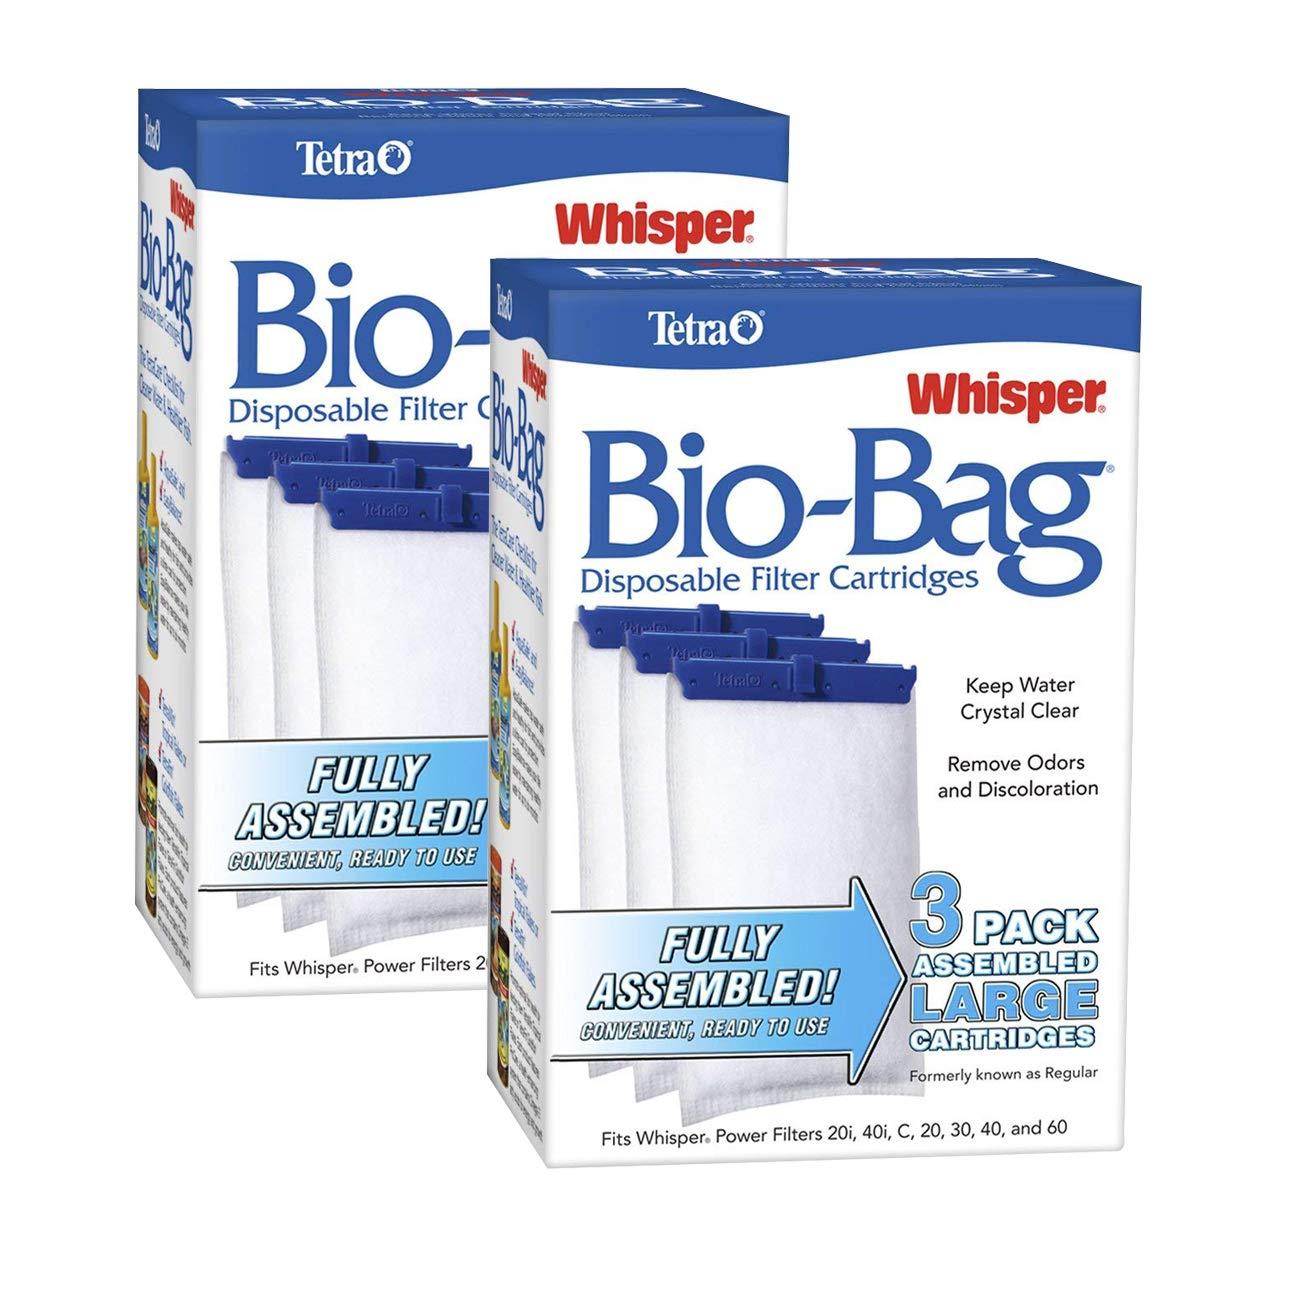 Tetra Whisper Assembled Bio-bag Filter Cartridges, Large, 6-Count